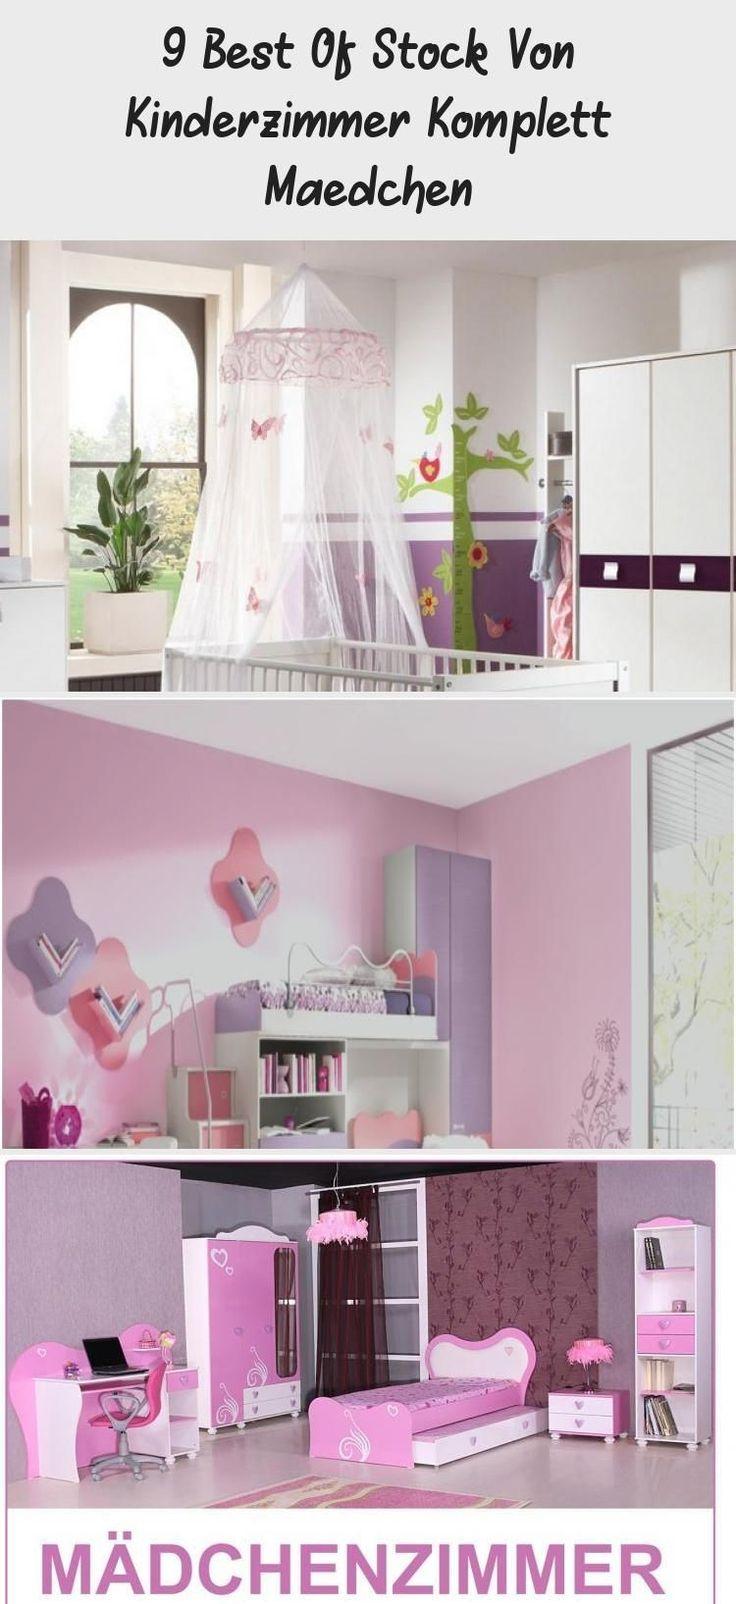 Kinderzimmer Komplett Madchen Stock 9 Best Of 9 Best Of Stock Of Kinderzimmer Komplett Madchen In 2020 Children Room Girl Kids Rooms Diy Room